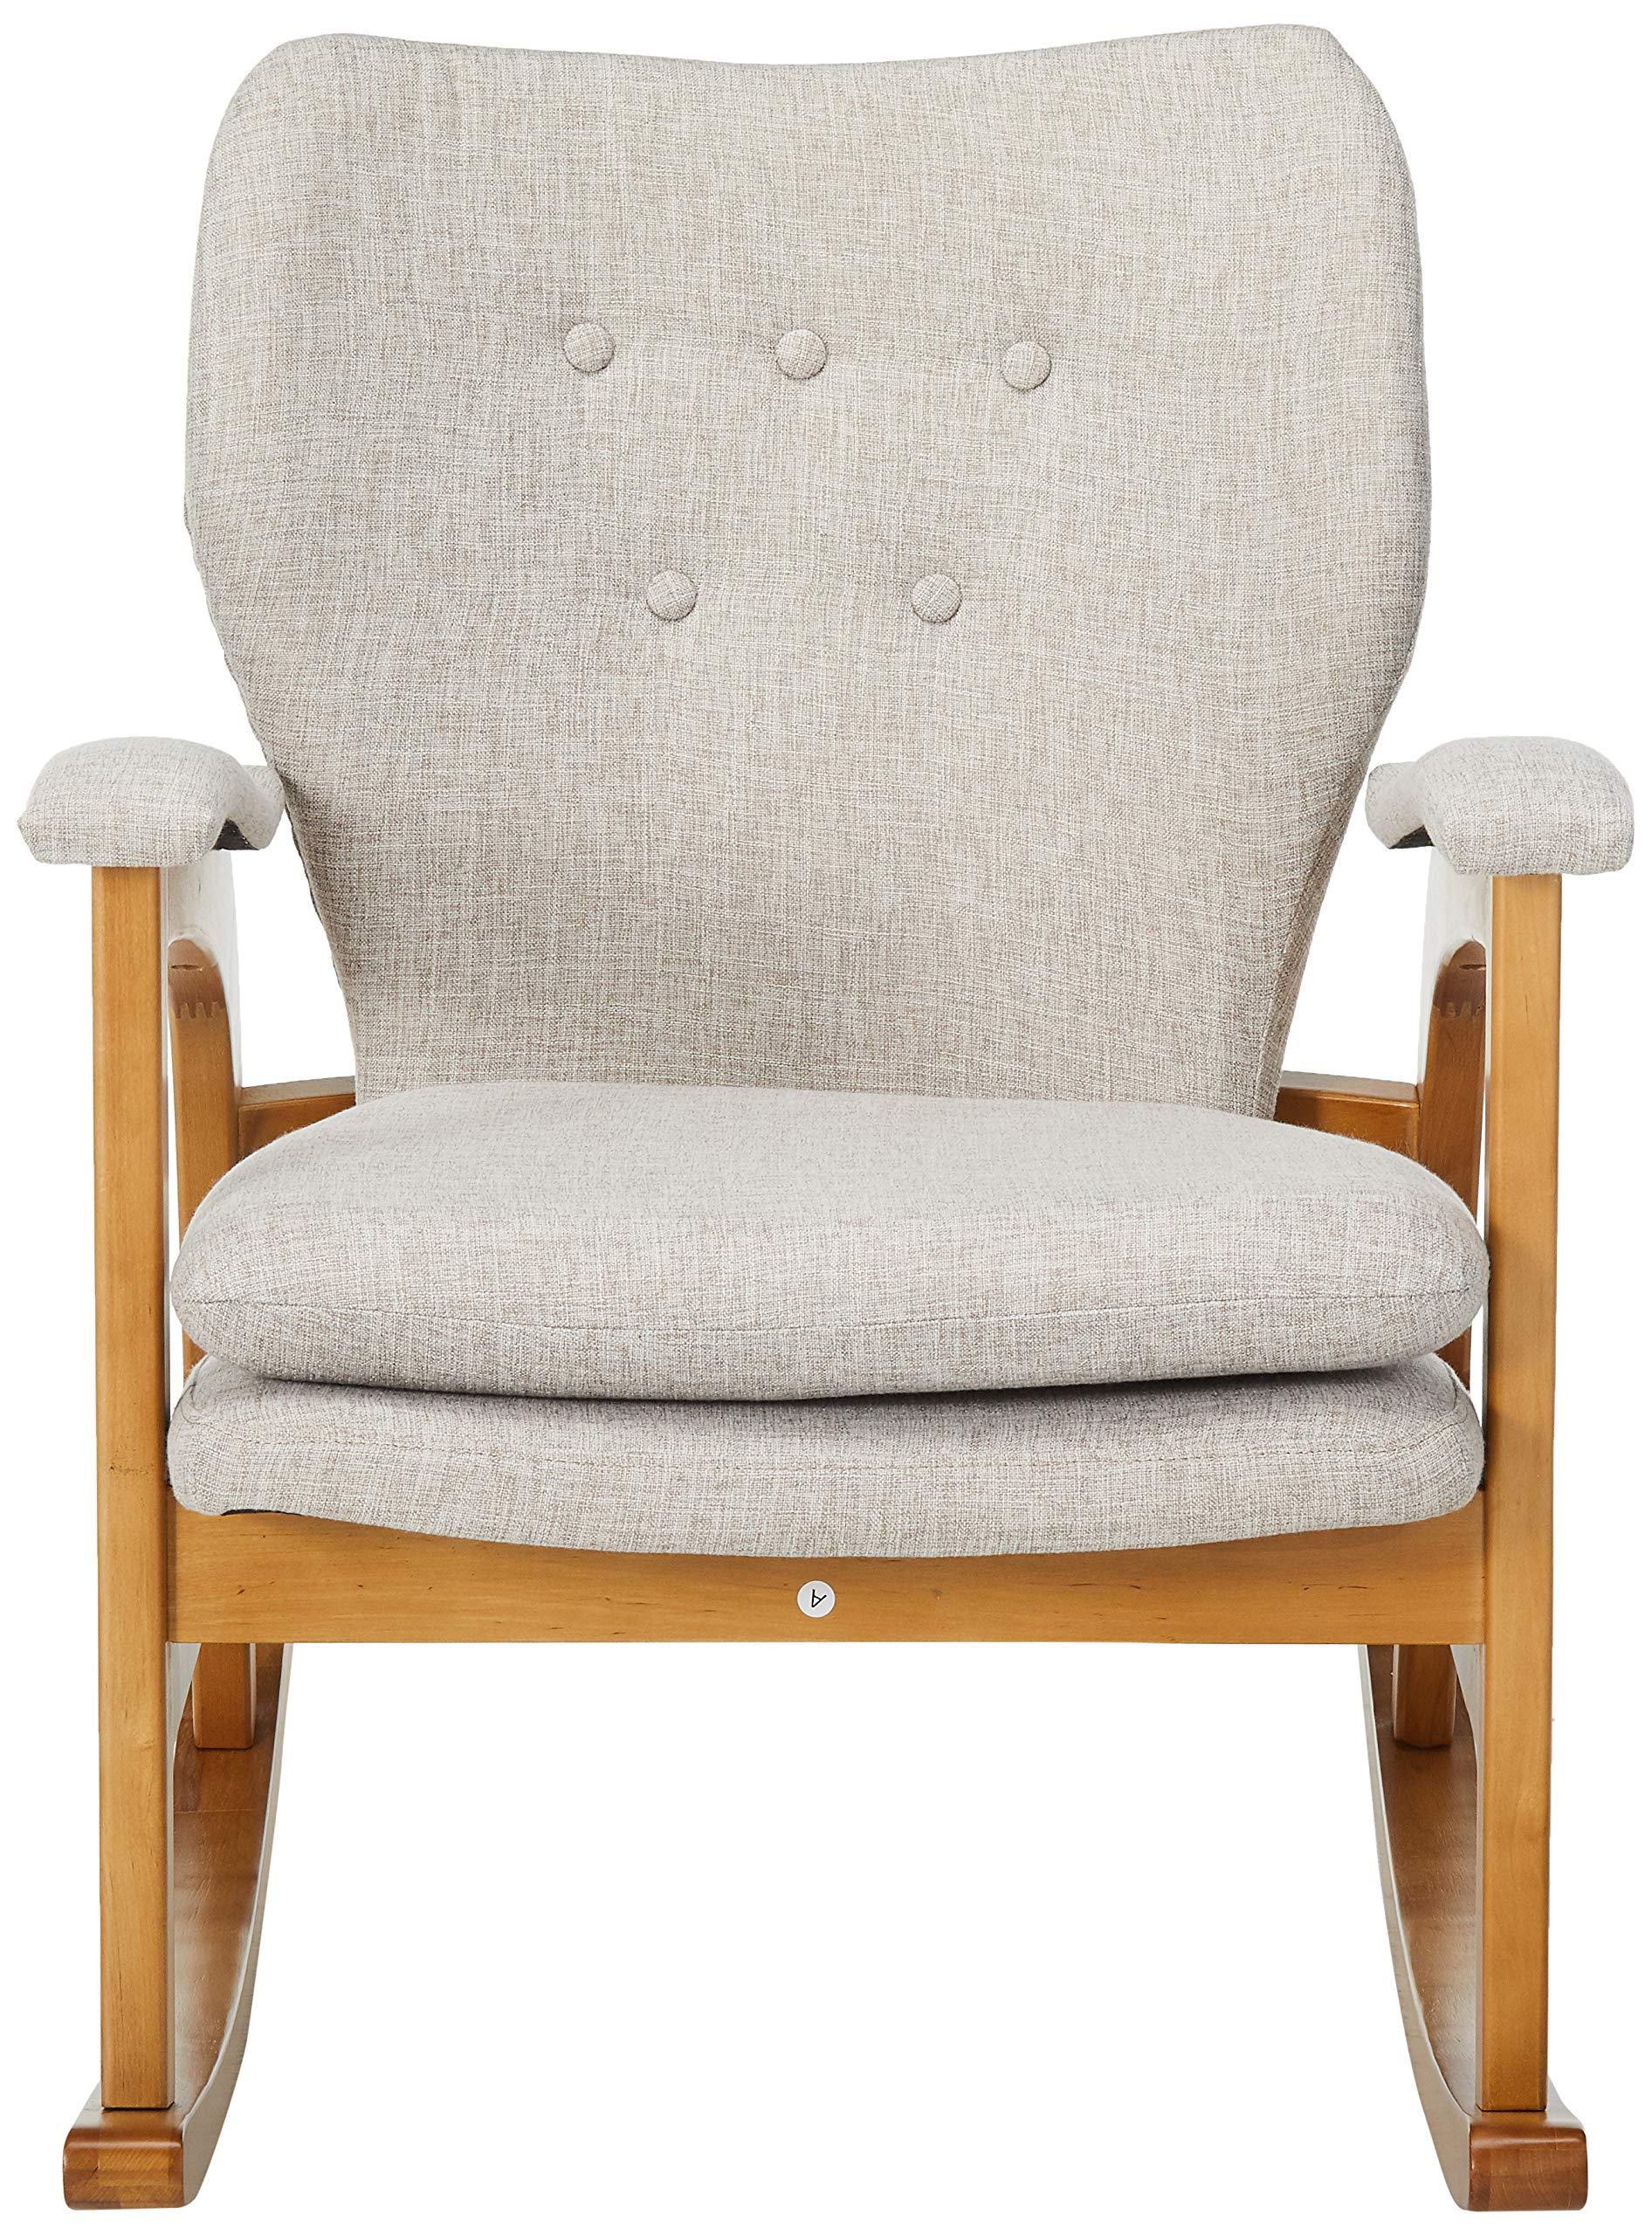 Christopher Knight Home Brannt Mid-Century Fabric Rocker, Wheat / Light Walnut